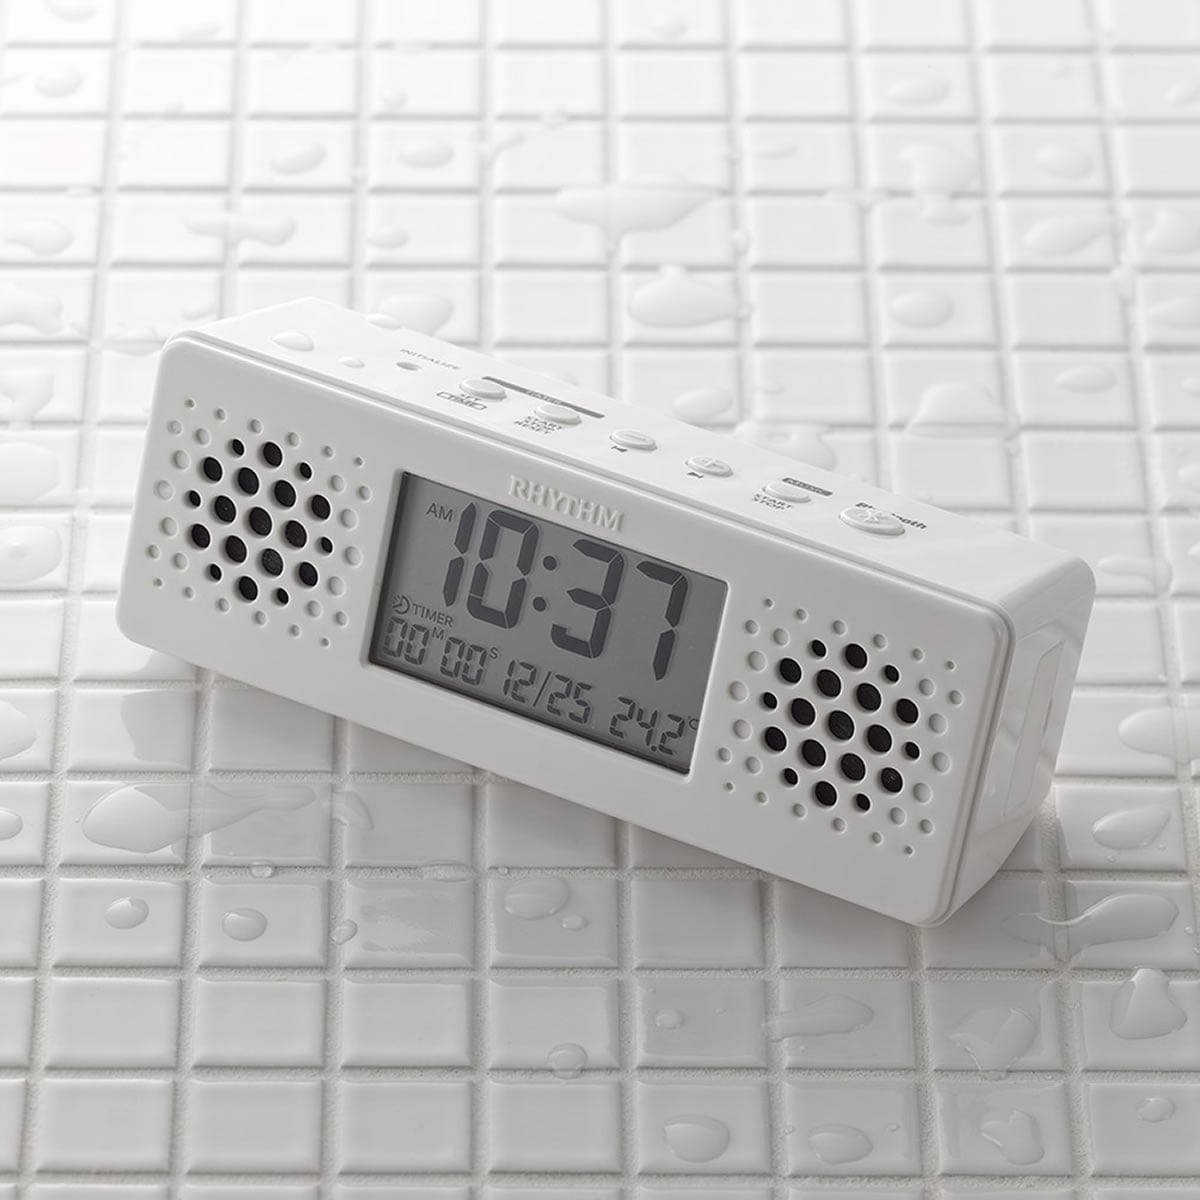 RHYTHM(リズム)Bluetoothスピーカー付きバスクロック アクアプルーフミュージック 8RDA73RH03